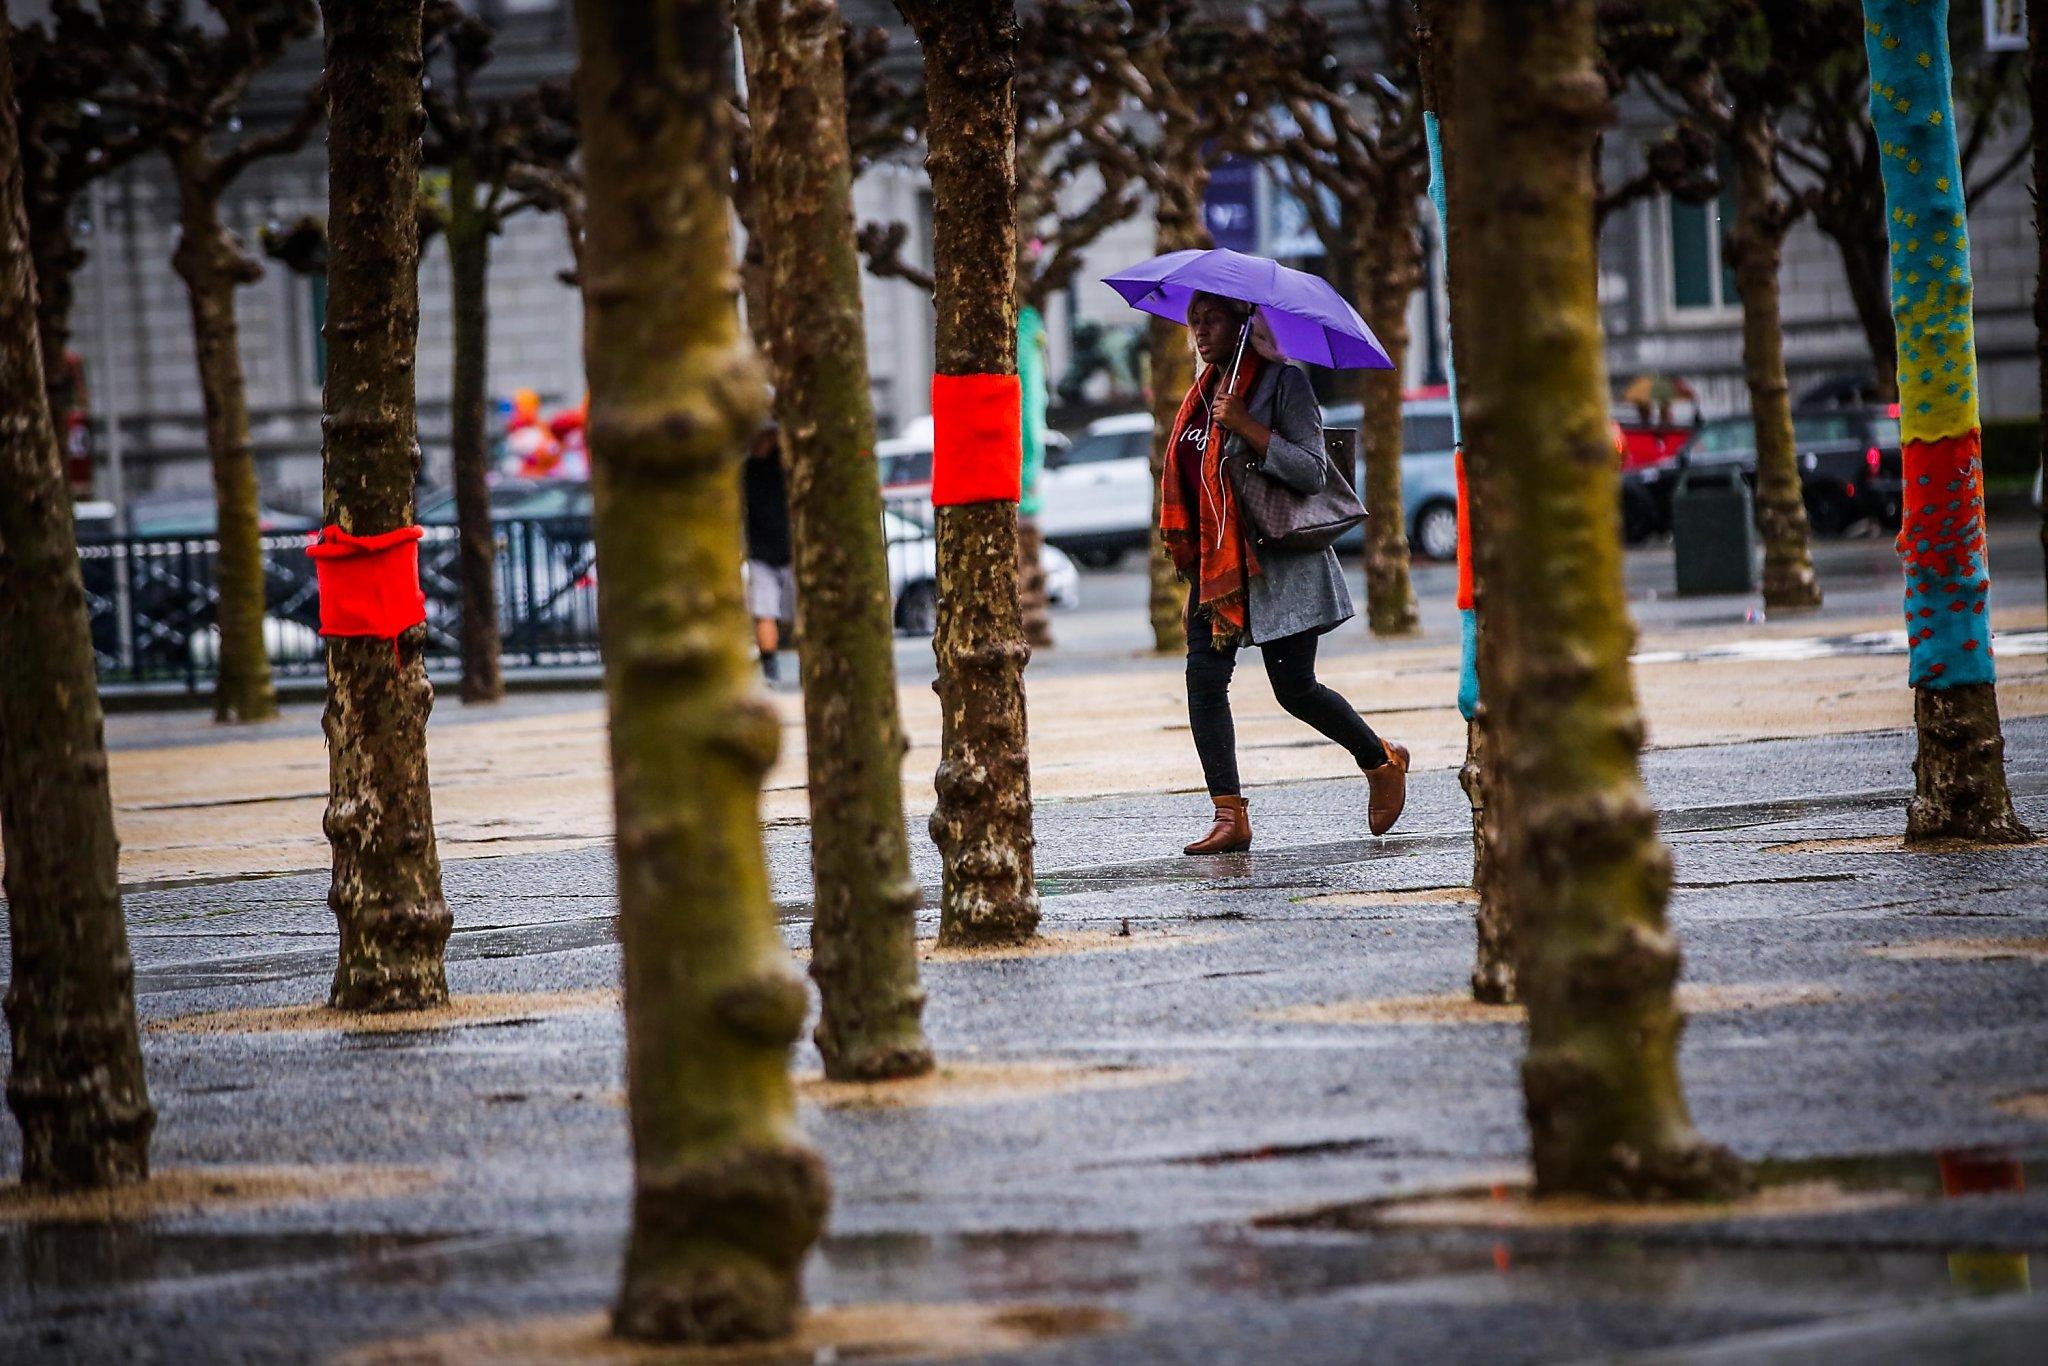 Strong storm brings Bay Area flood warnings, high wind advisories | San Francisco Gate